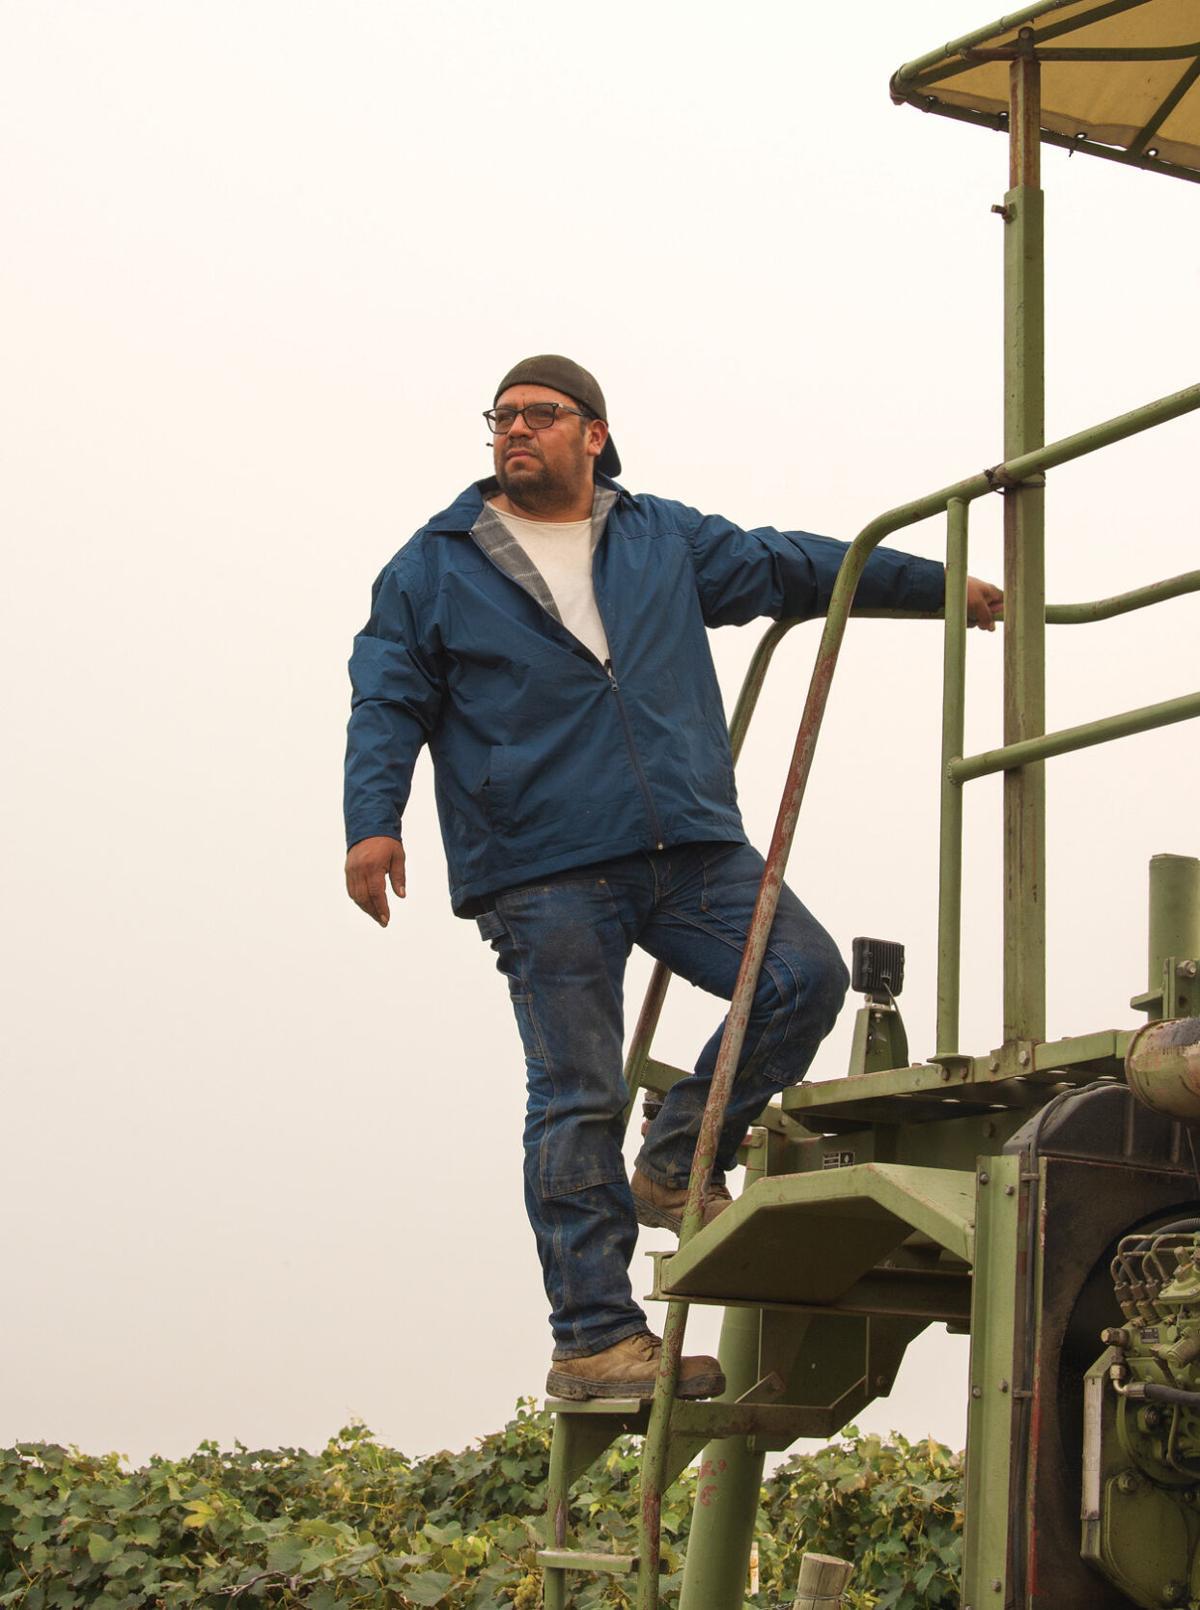 10_07 Leatherneck Farms Harvester Driver_MS_COPY_PWS9907.jpg